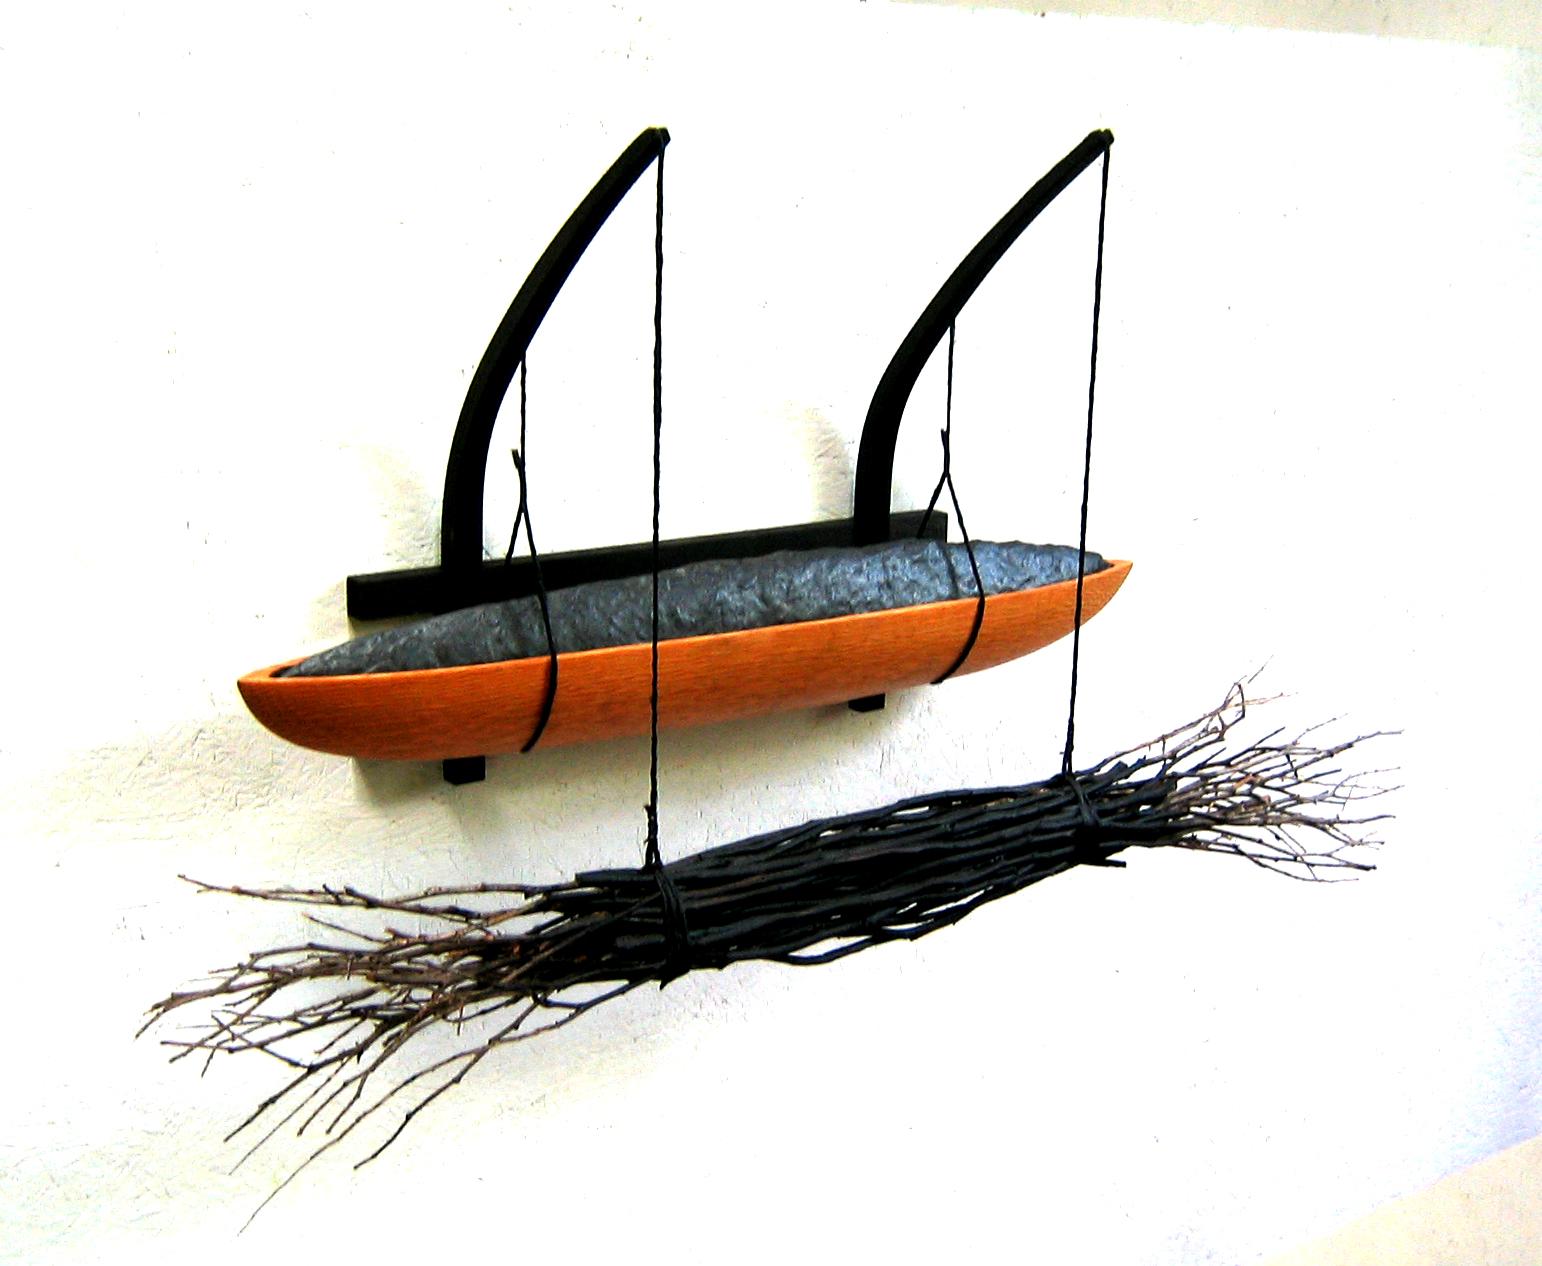 Boat of sticks-a.jpg